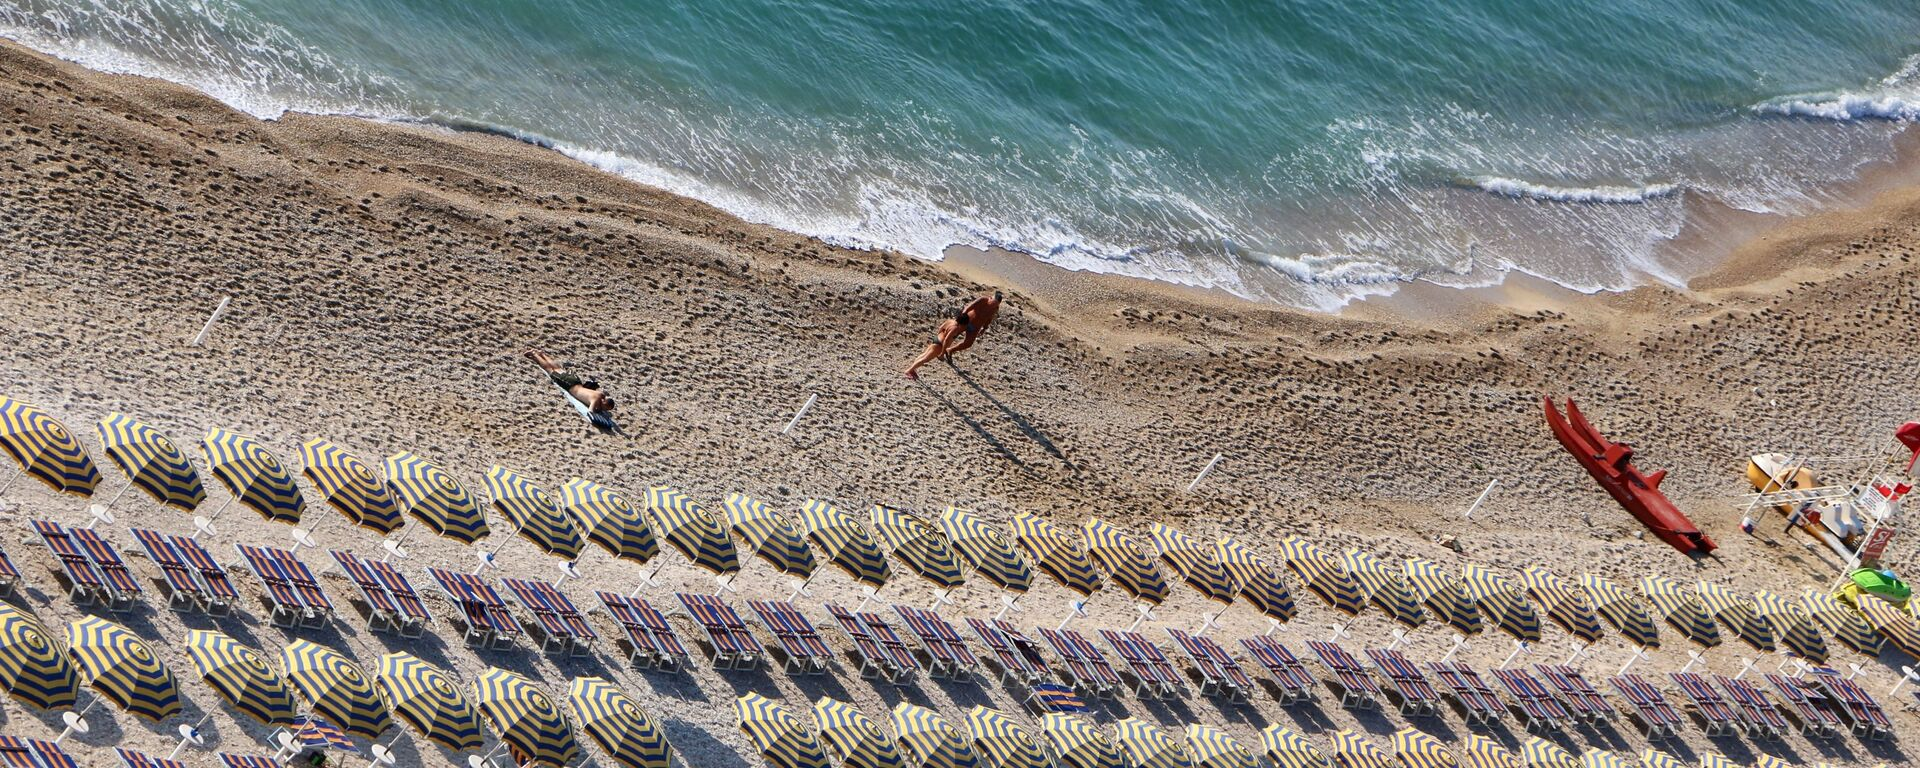 Una spiaggia quasi vuota - Sputnik Italia, 1920, 05.09.2020